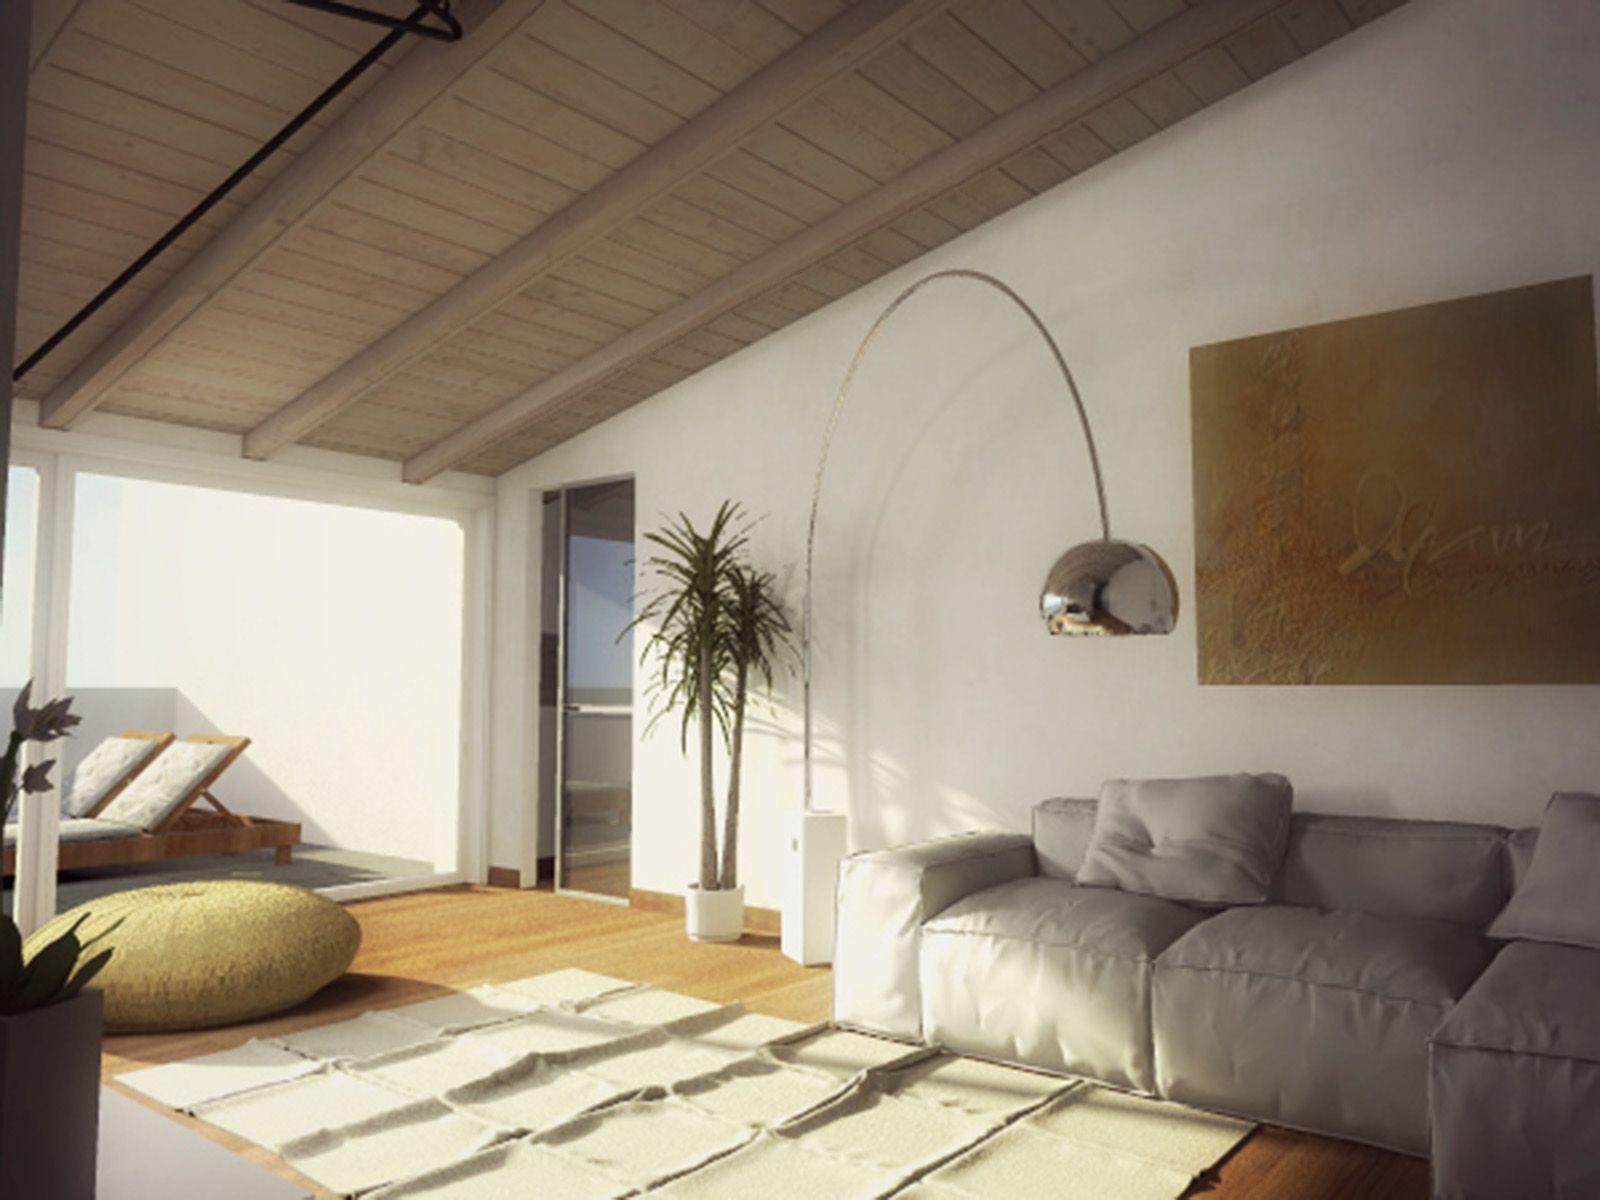 Mansarda: una casa sottotetto luminosa e contemporanea | Mansarda ...